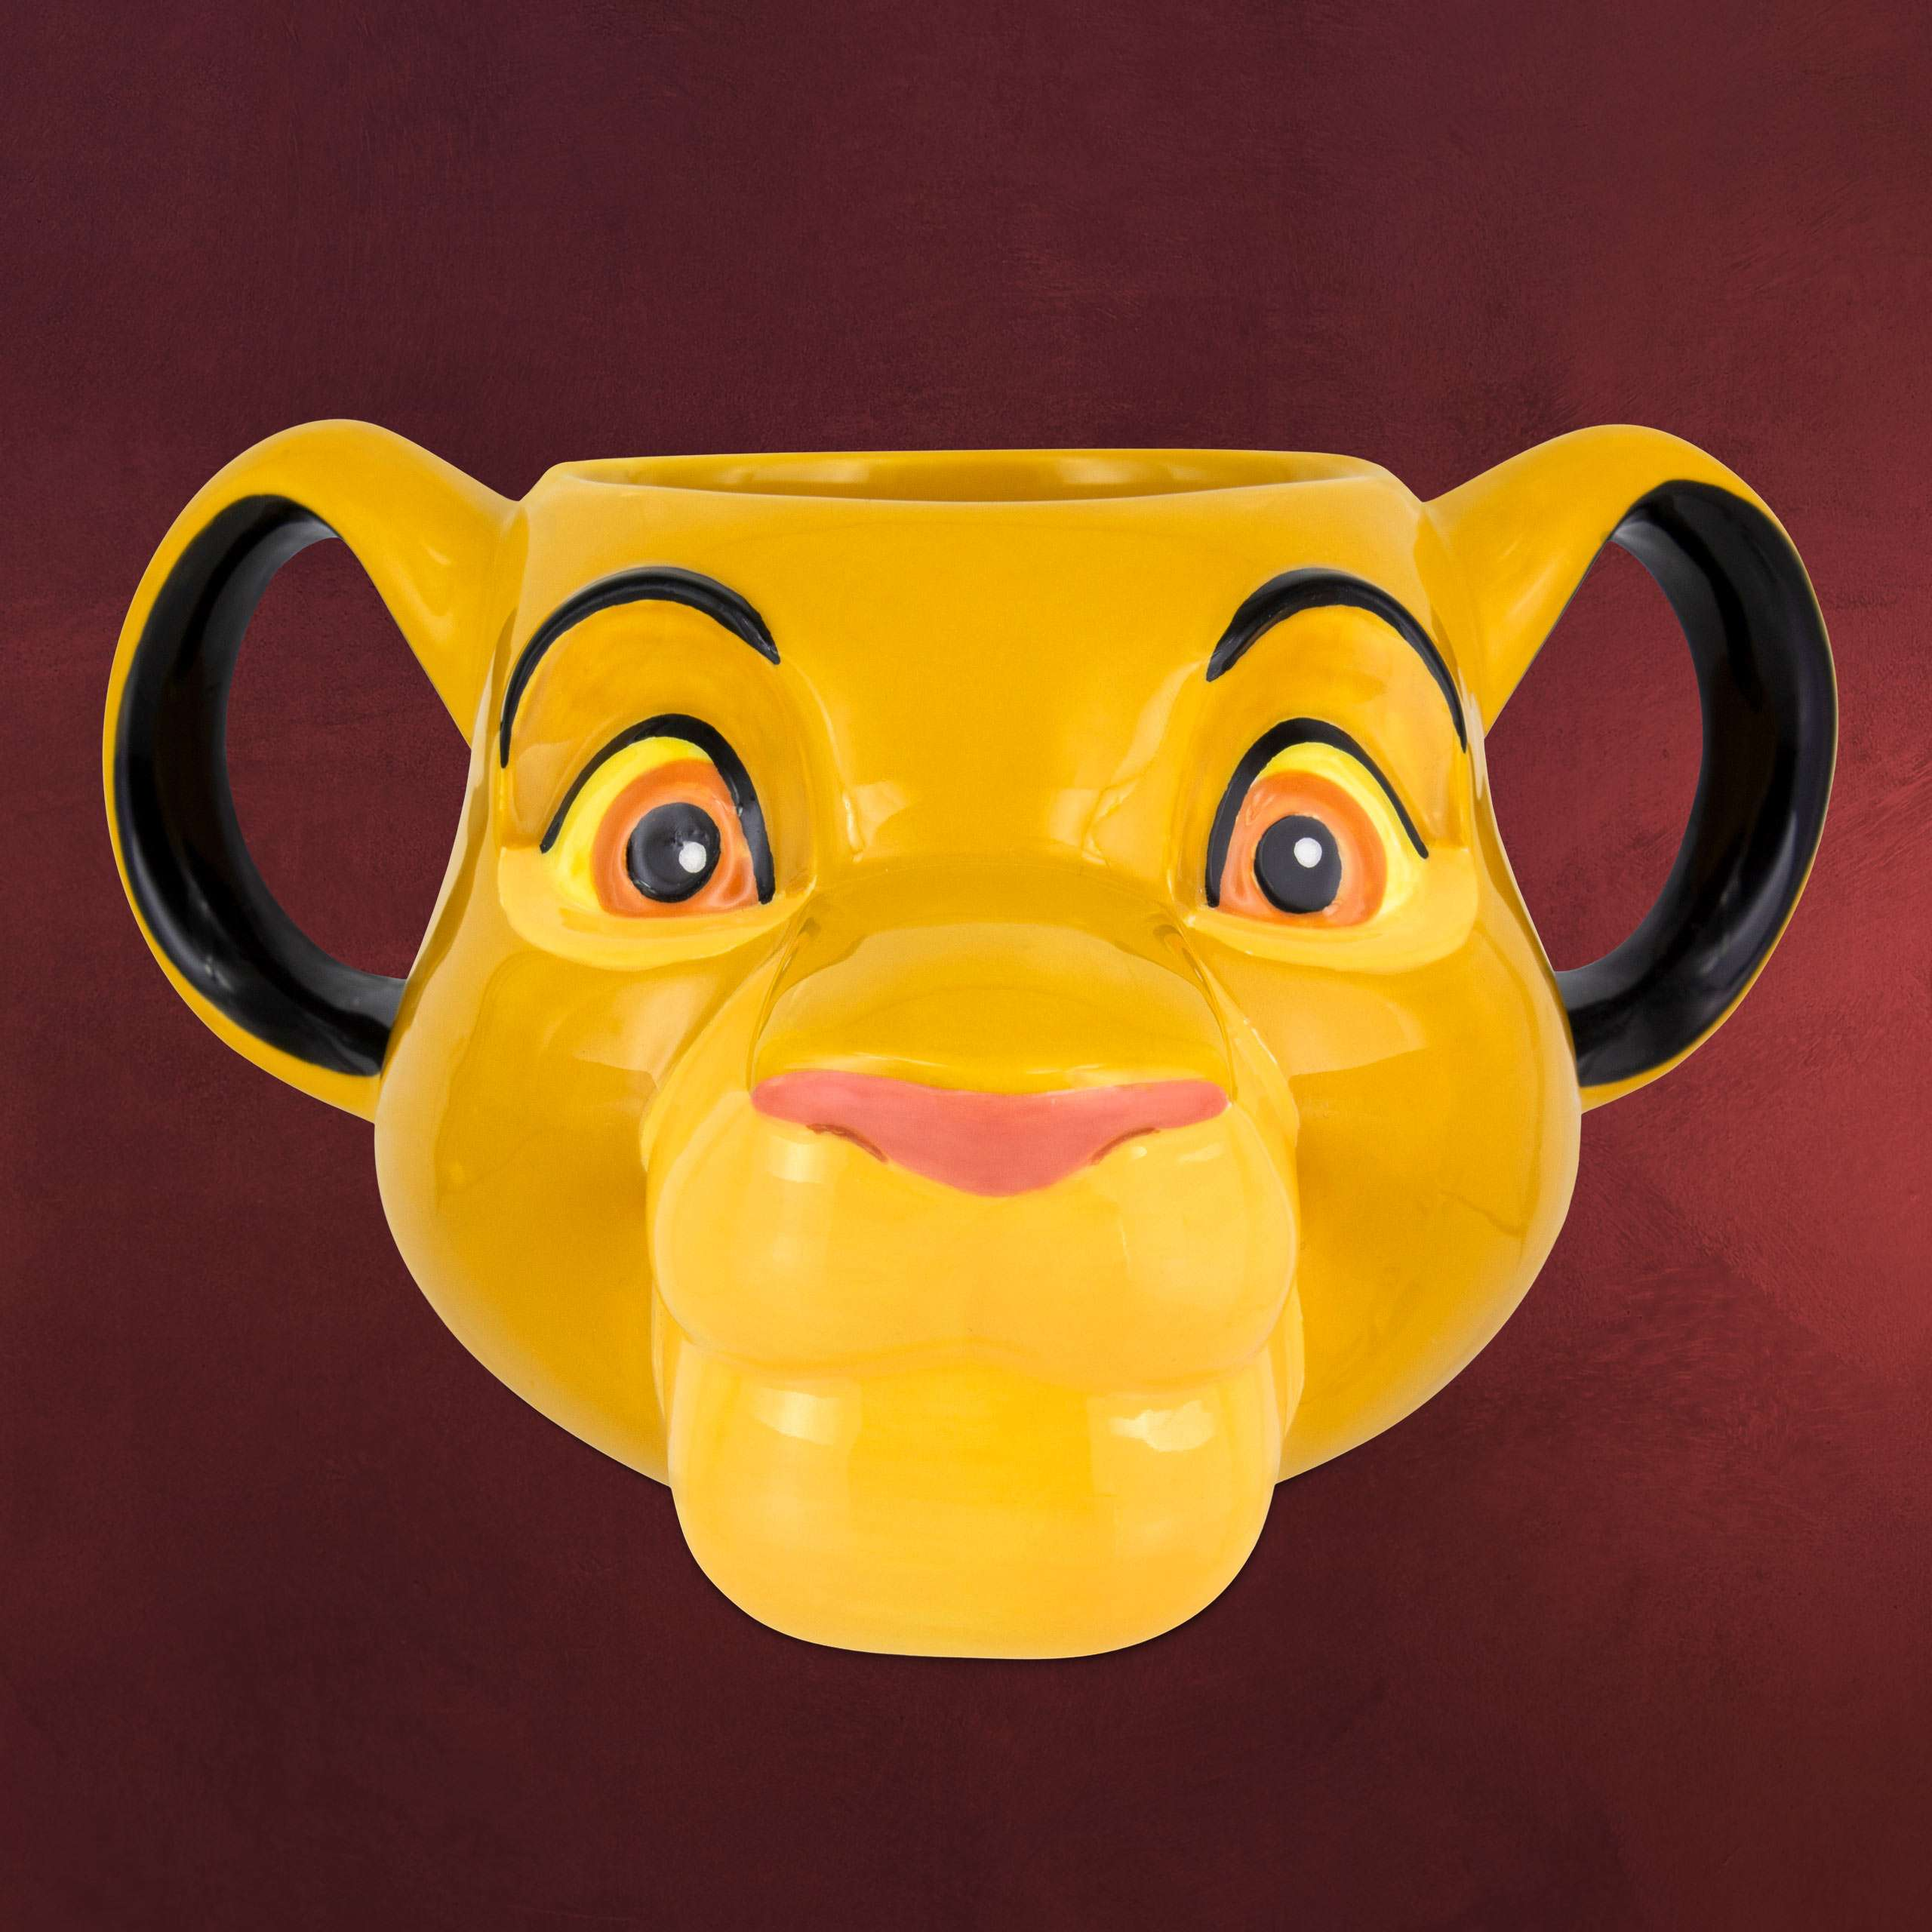 Disney Premium Notizbuch K/önig der L/öwen Simba 3D Pl/üsch